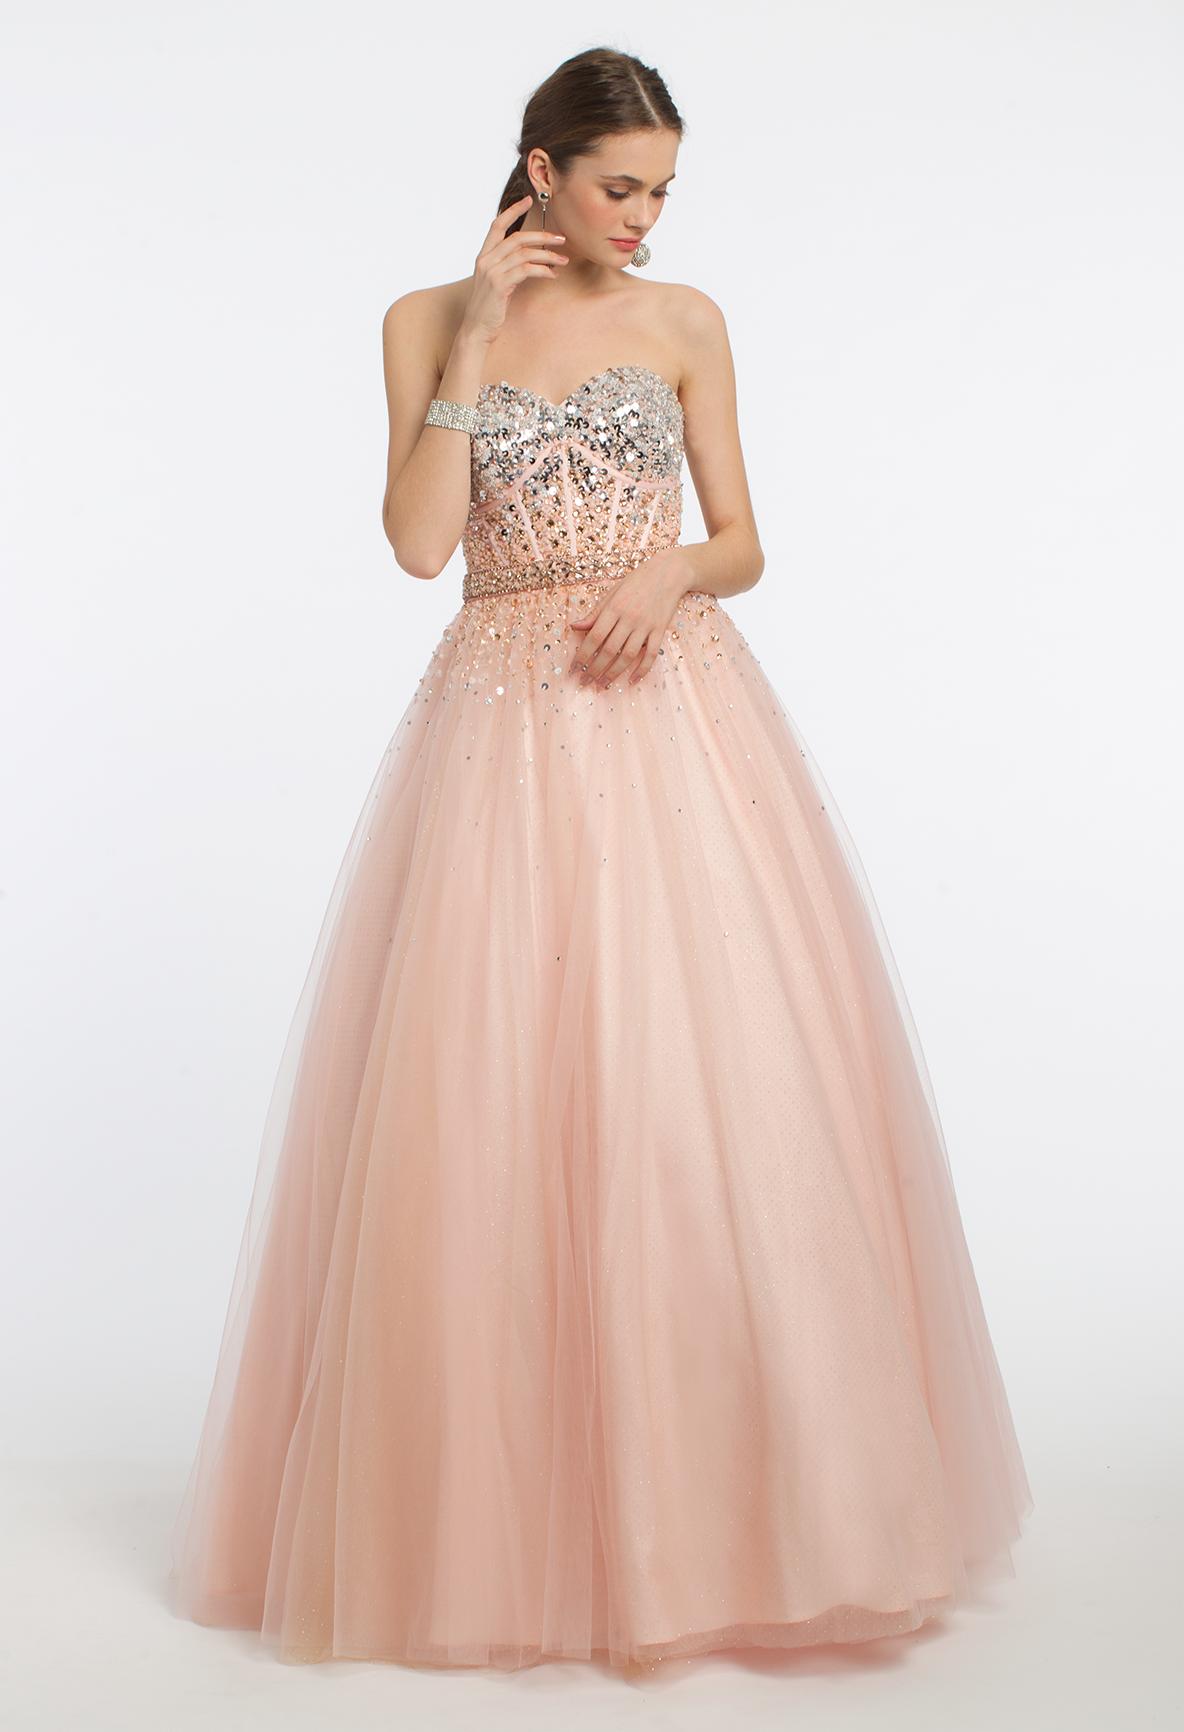 Nothing Under Prom Dress